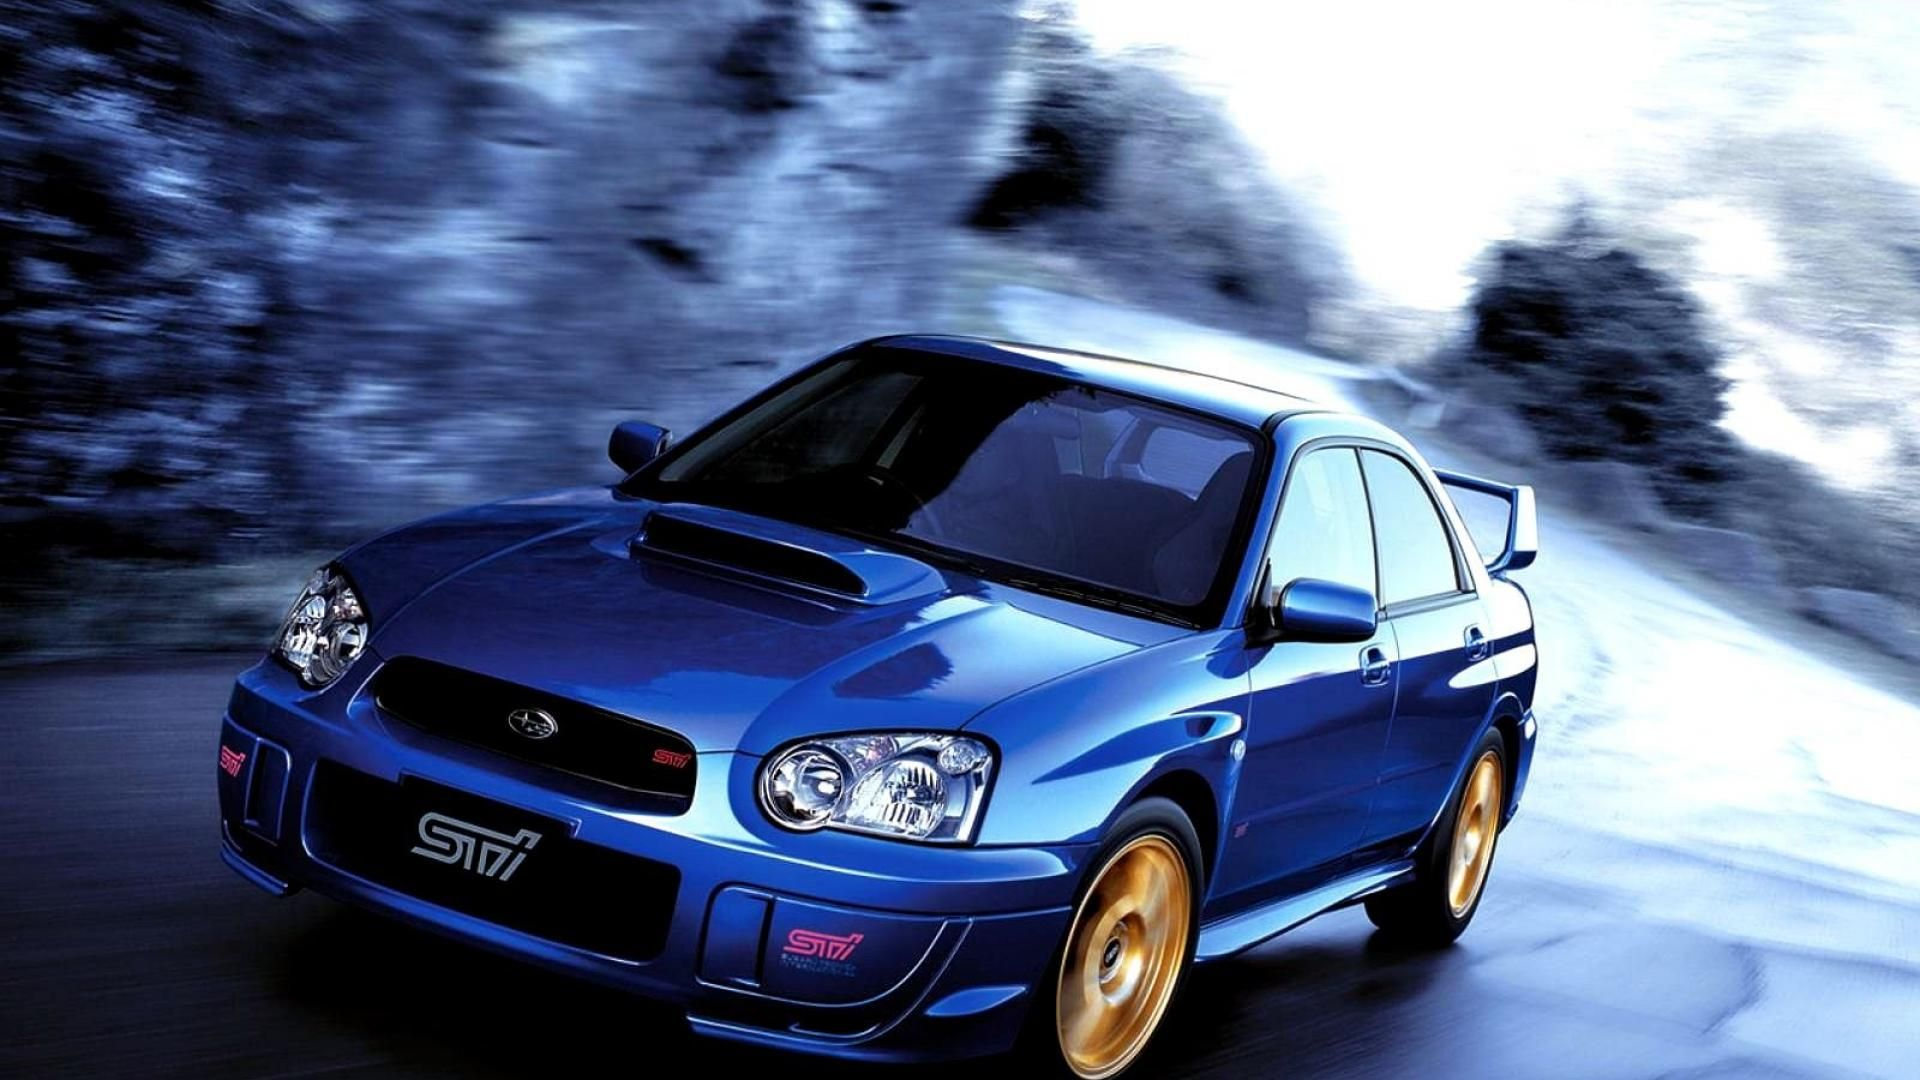 Subaru Impreza Car Wallpaper 1080p Subaru Impreza Wrx Subaru